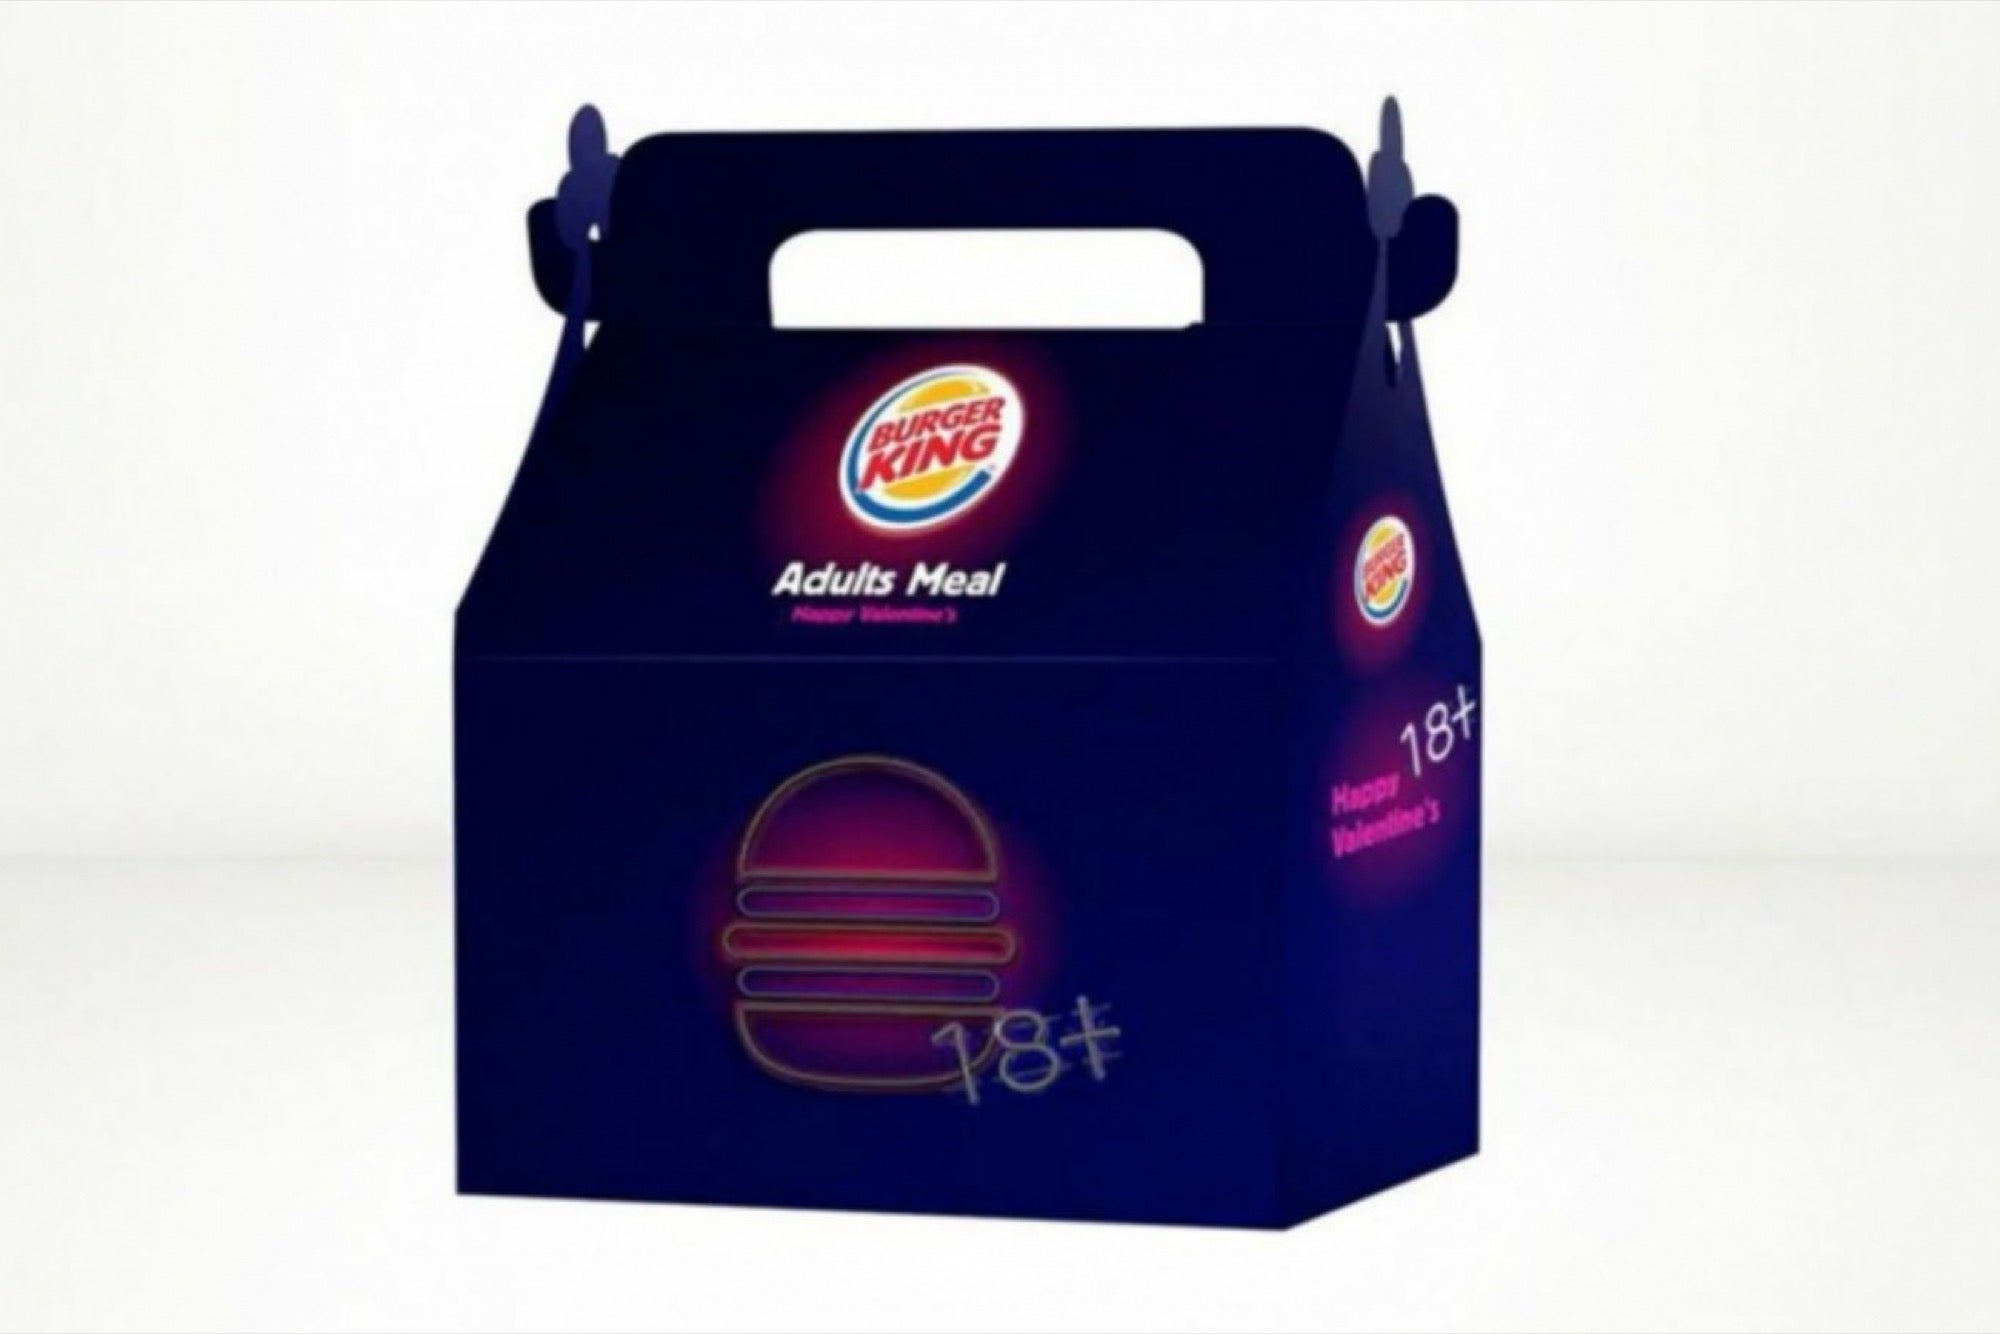 Eróticos En Burger San Valentín Ofreció Juguetes King yPwvNOmn08